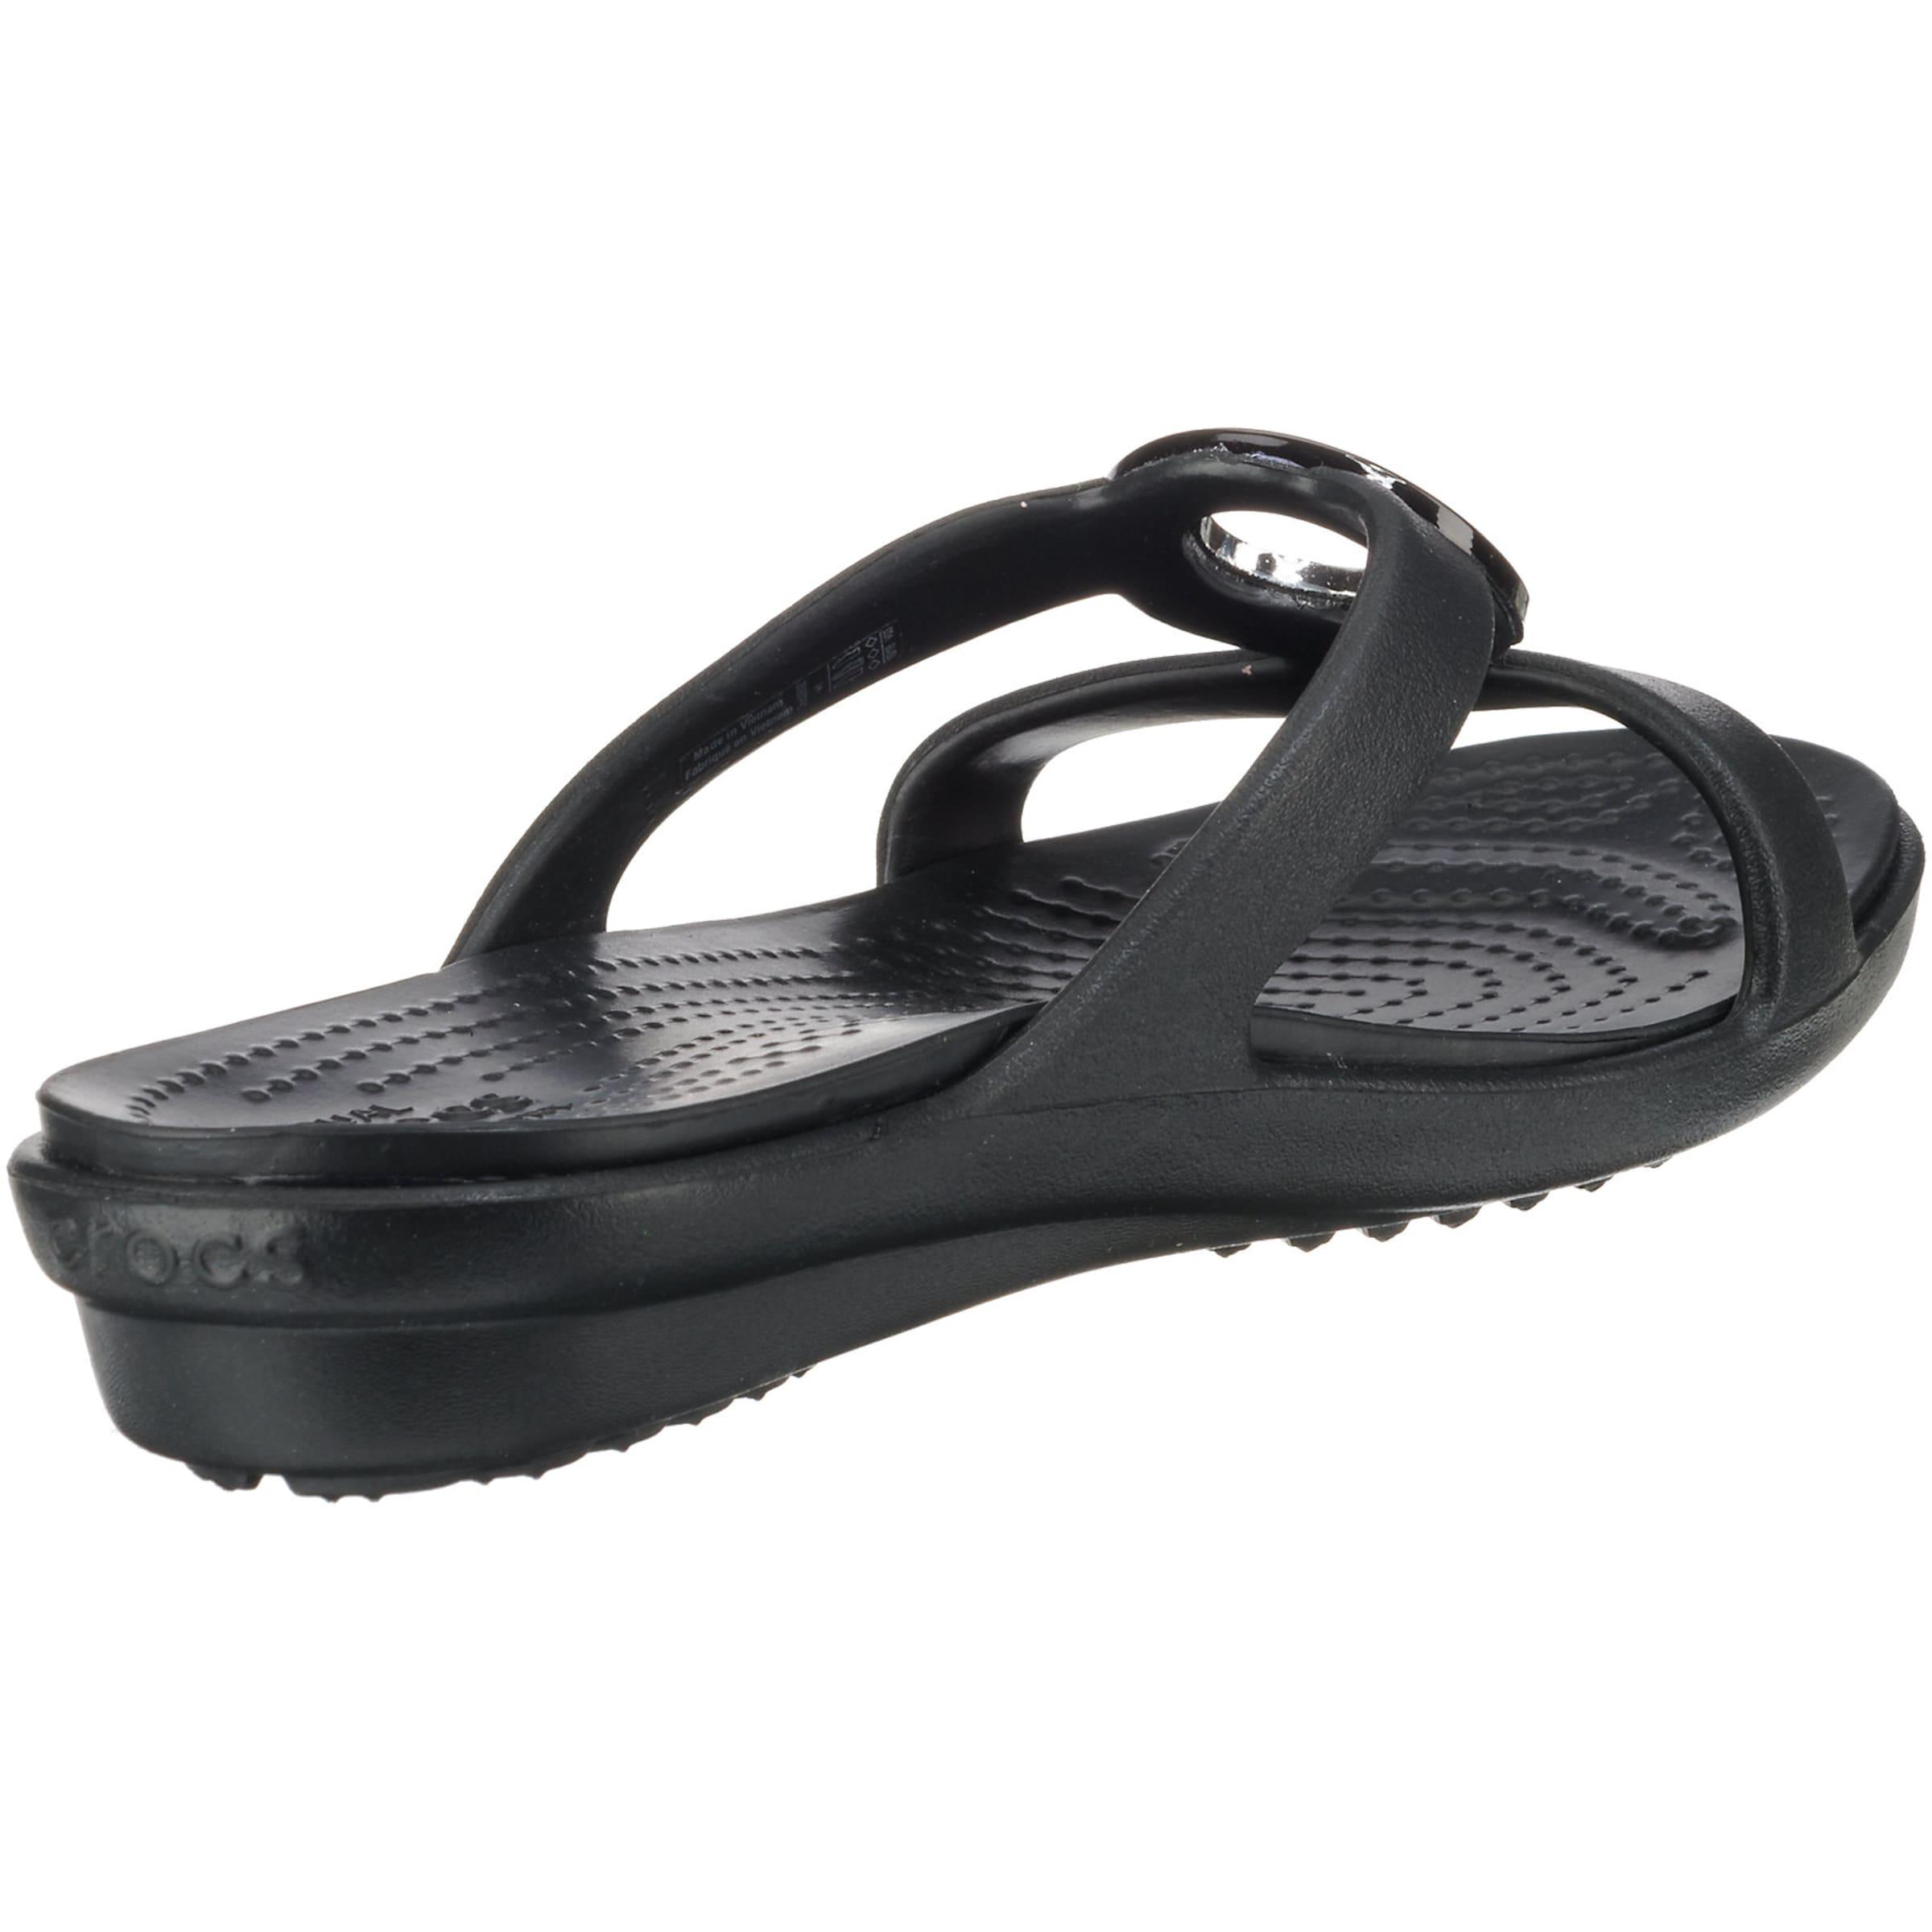 'sanrah' 'sanrah' Pantoletten Crocs Crocs In 'sanrah' Crocs SchwarzSilber Pantoletten Pantoletten In SchwarzSilber 8nwyvmON0